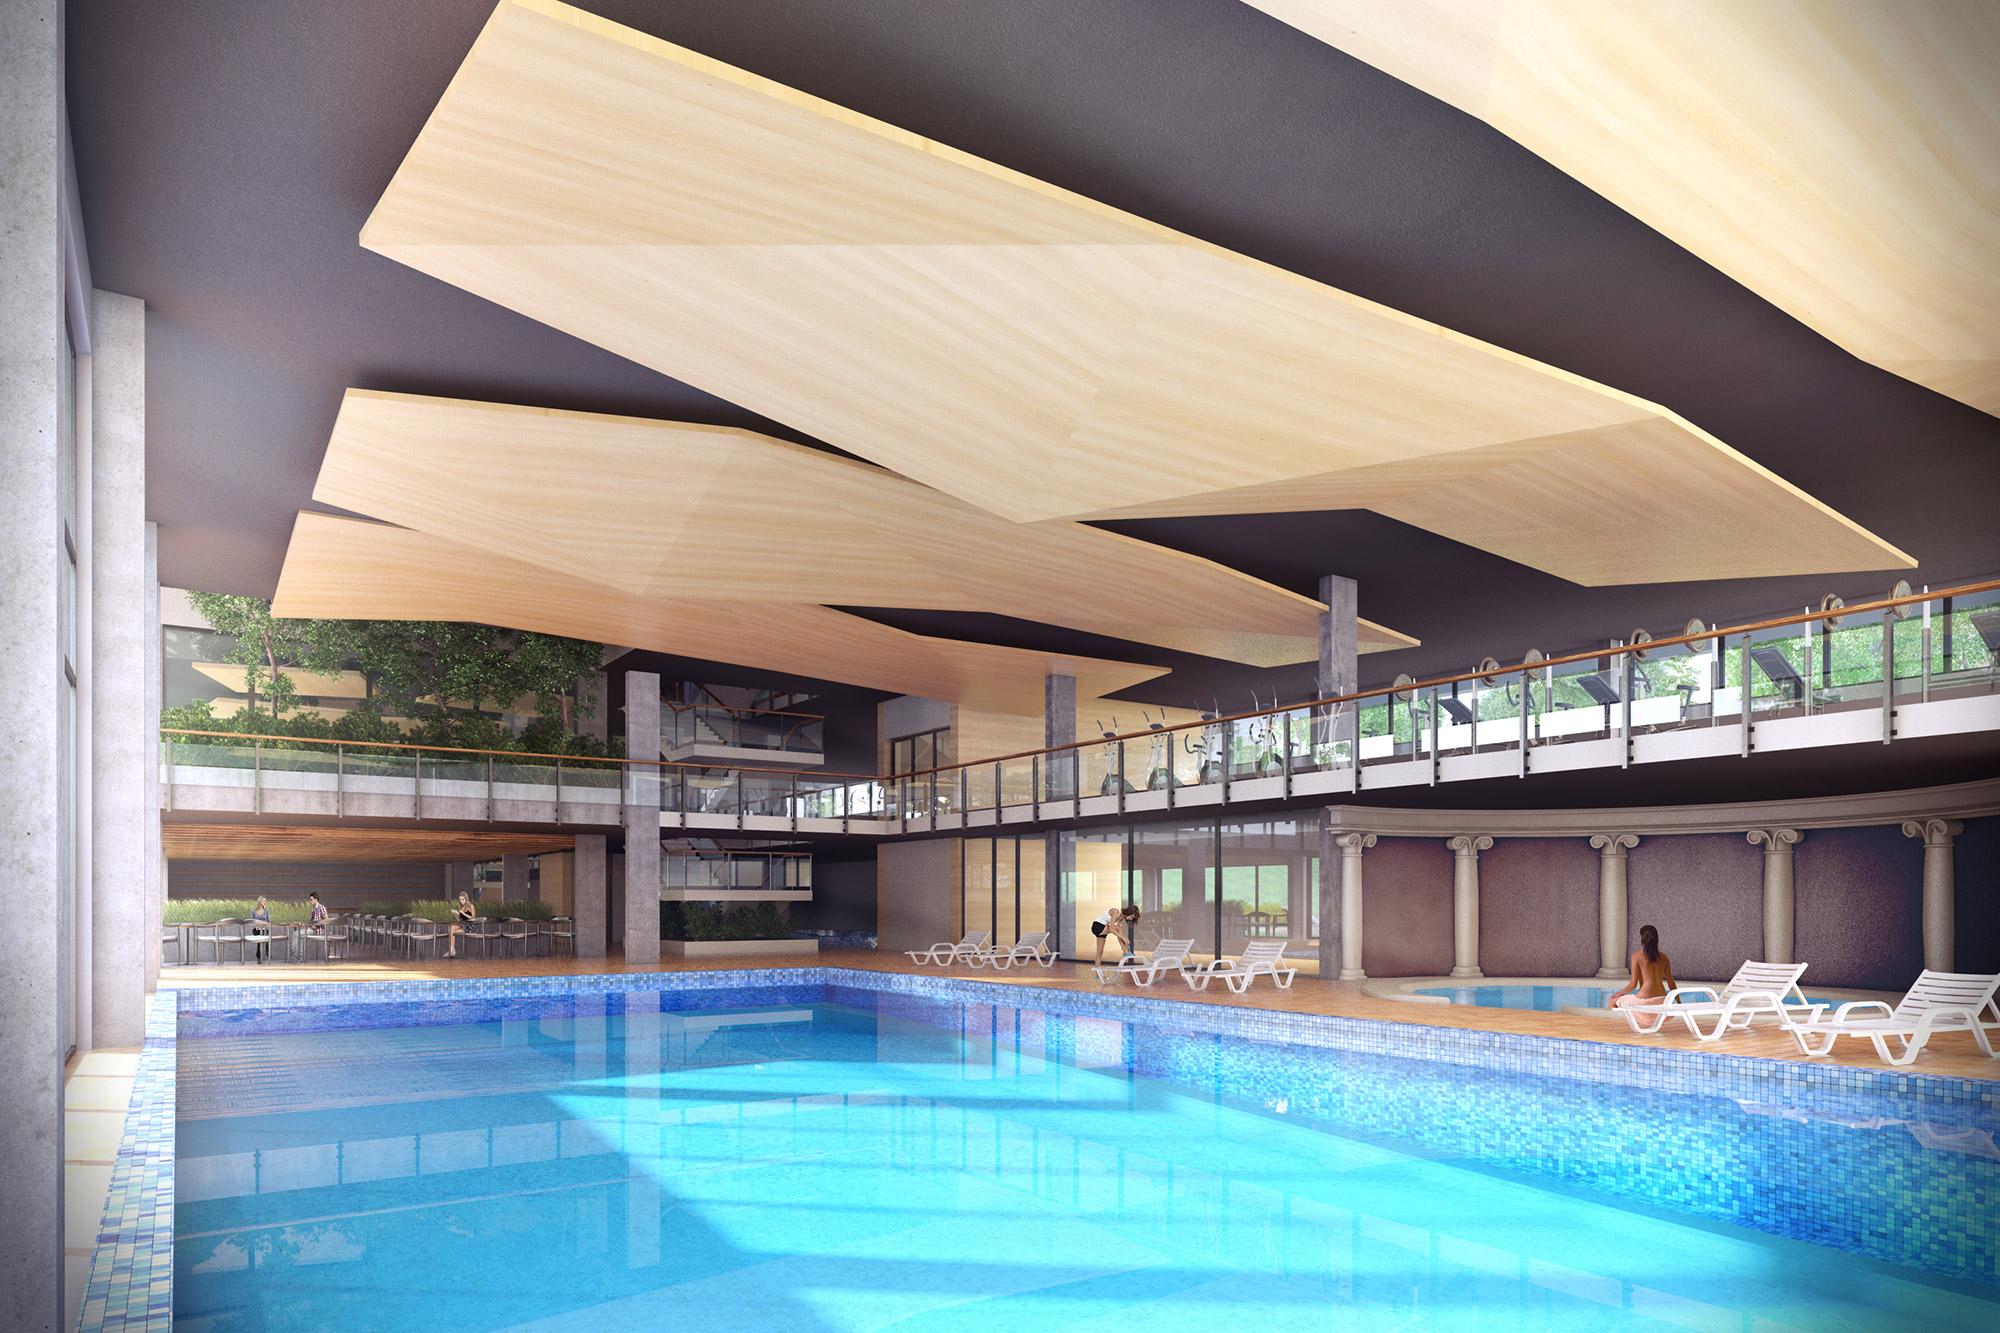 Yundola hotel velingrad kunchevarchdesign for Design hotels 2015